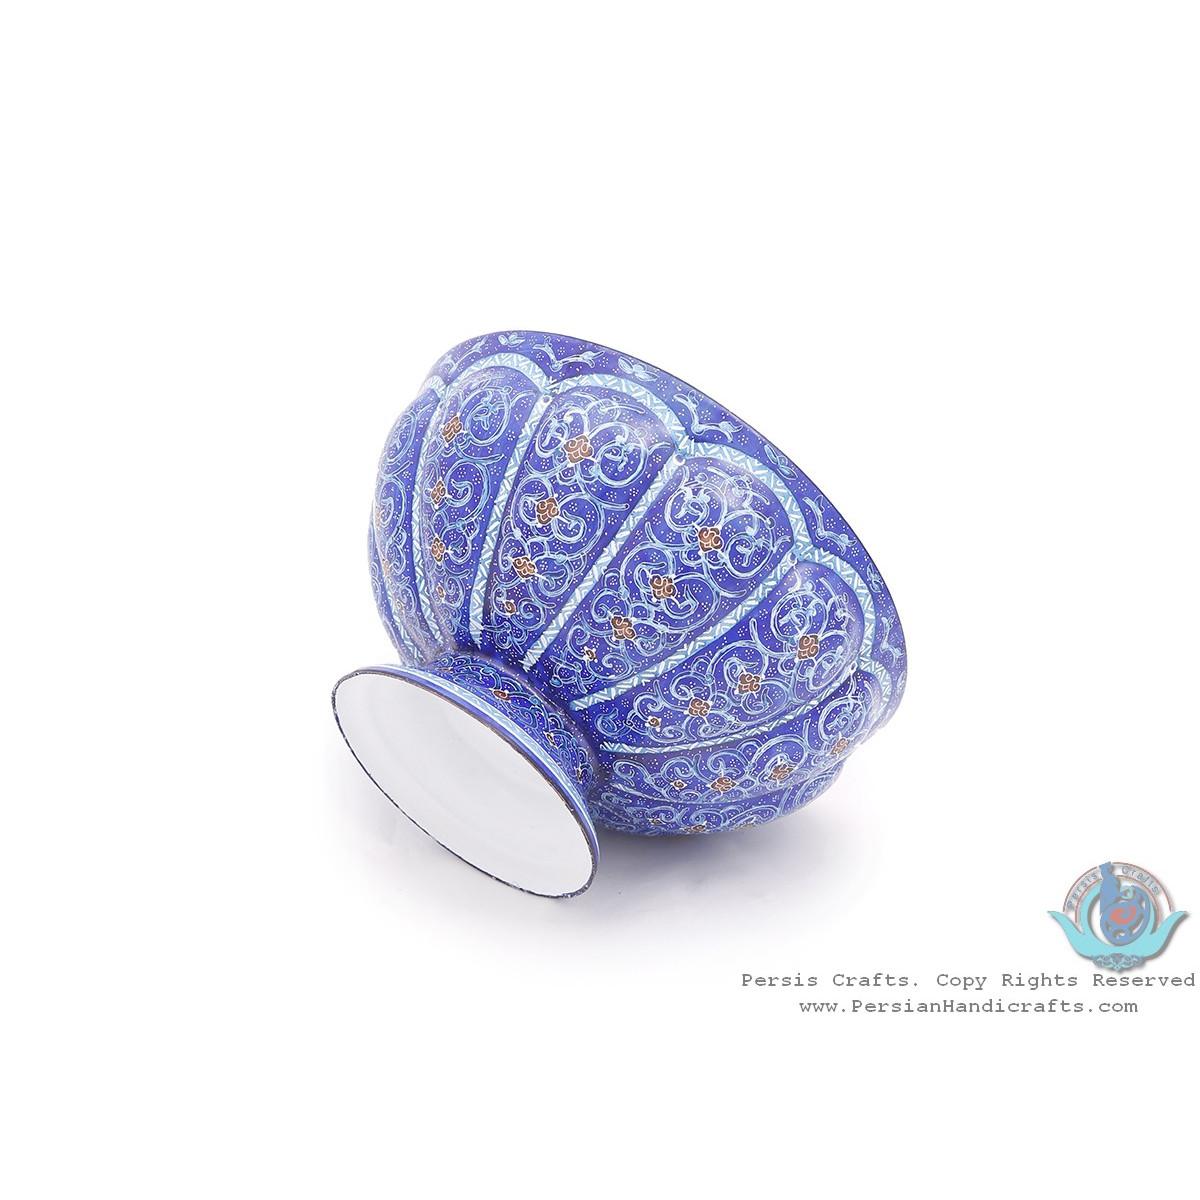 Privileged Enamel Protruded Eslimi Minakari Bowl & Plate - HE3914-Persian Handicrafts